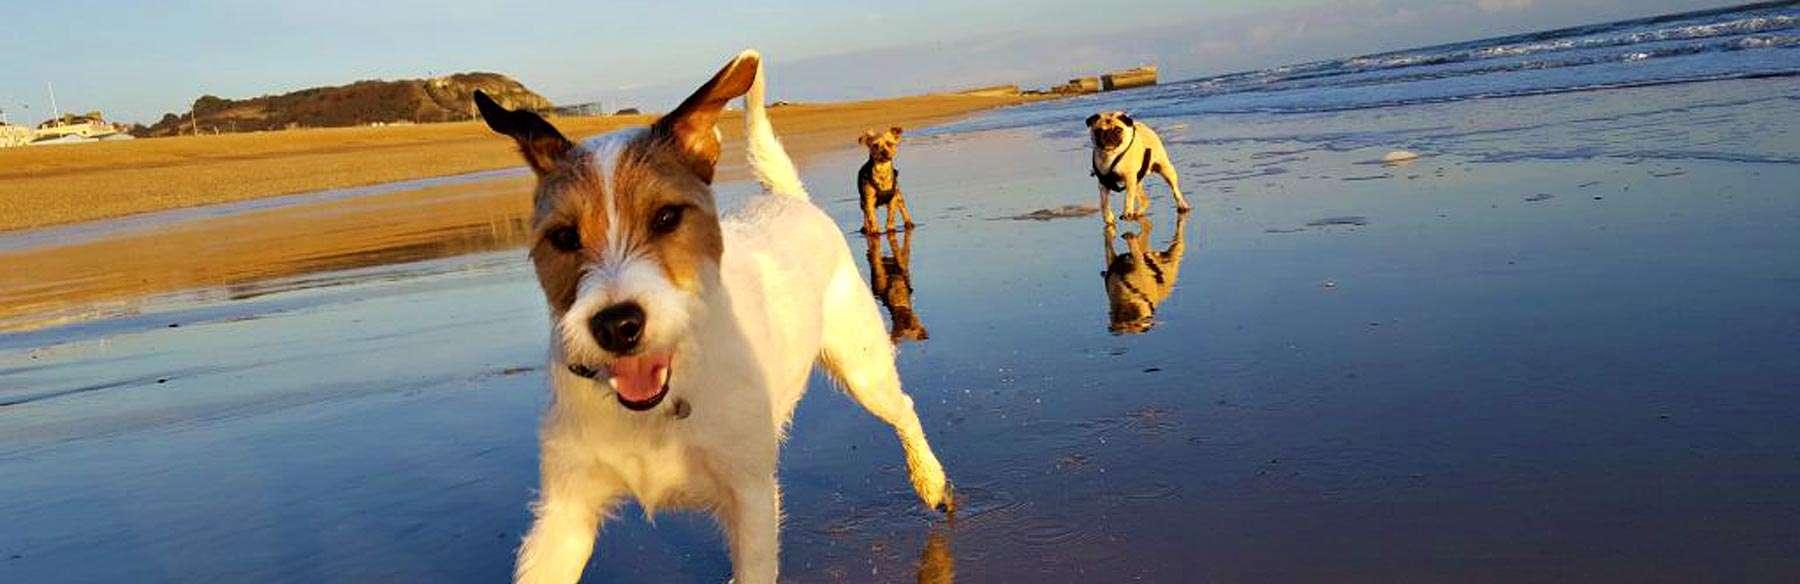 Pelham Beach - Dog Walk - Hastings Pet Care - St Leonards